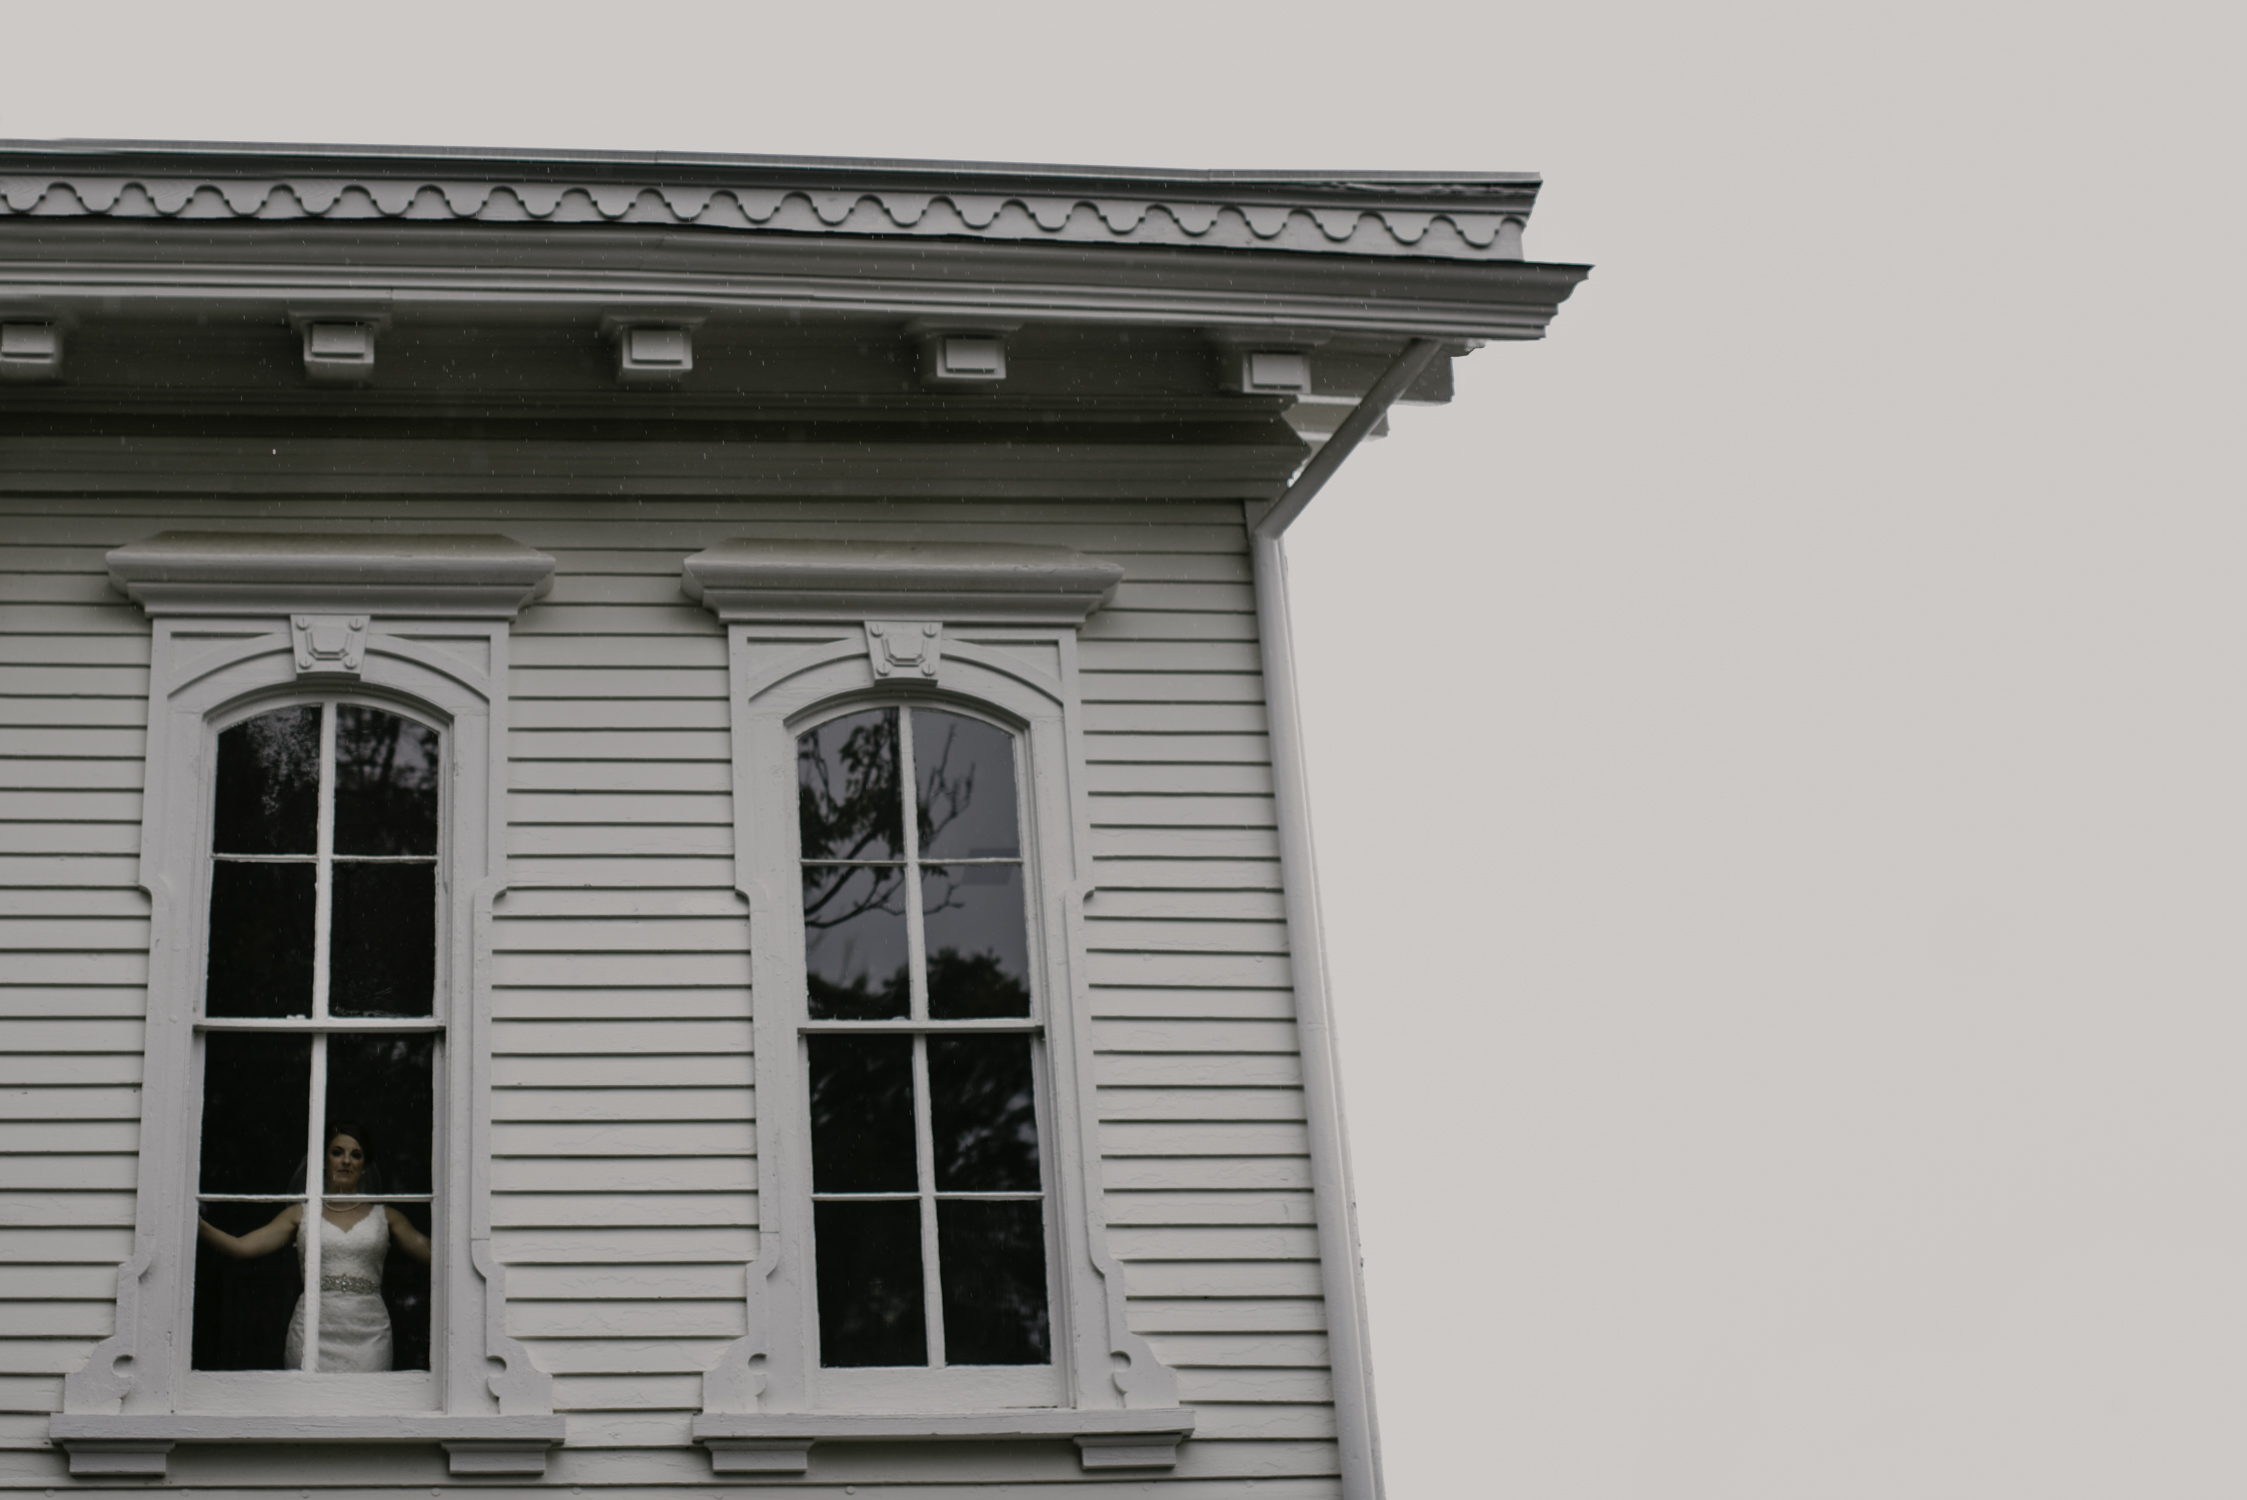 merrimon wynne second floor window portait.